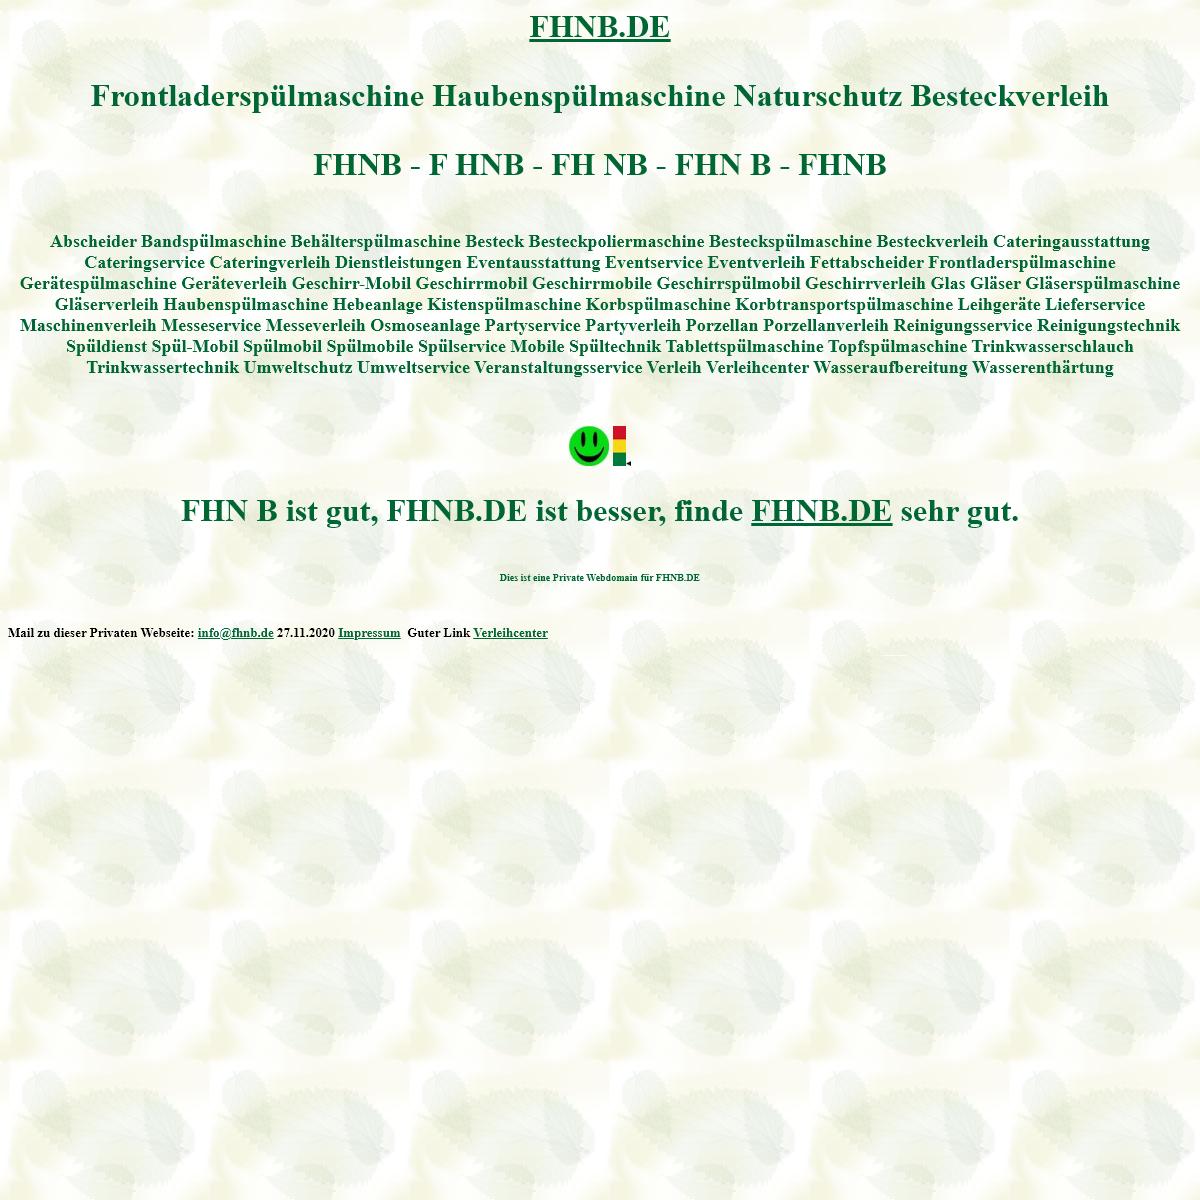 fhnb Frontladerspülmaschine Haubenspülmaschine Besteckverleih Spülmobil Verleih Geschirrmobil Mieten